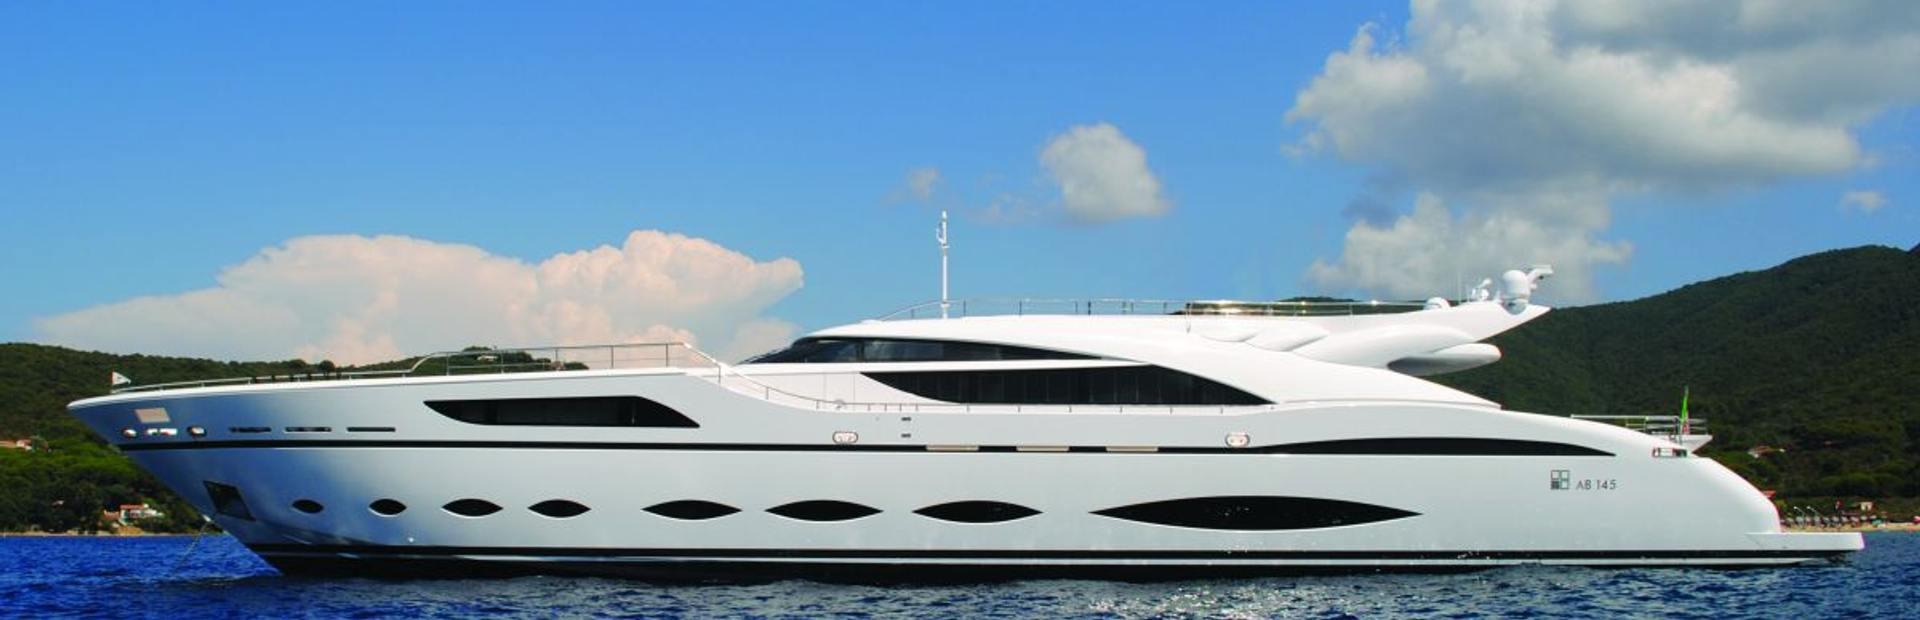 AB Yachts AB 145 Yacht Charter